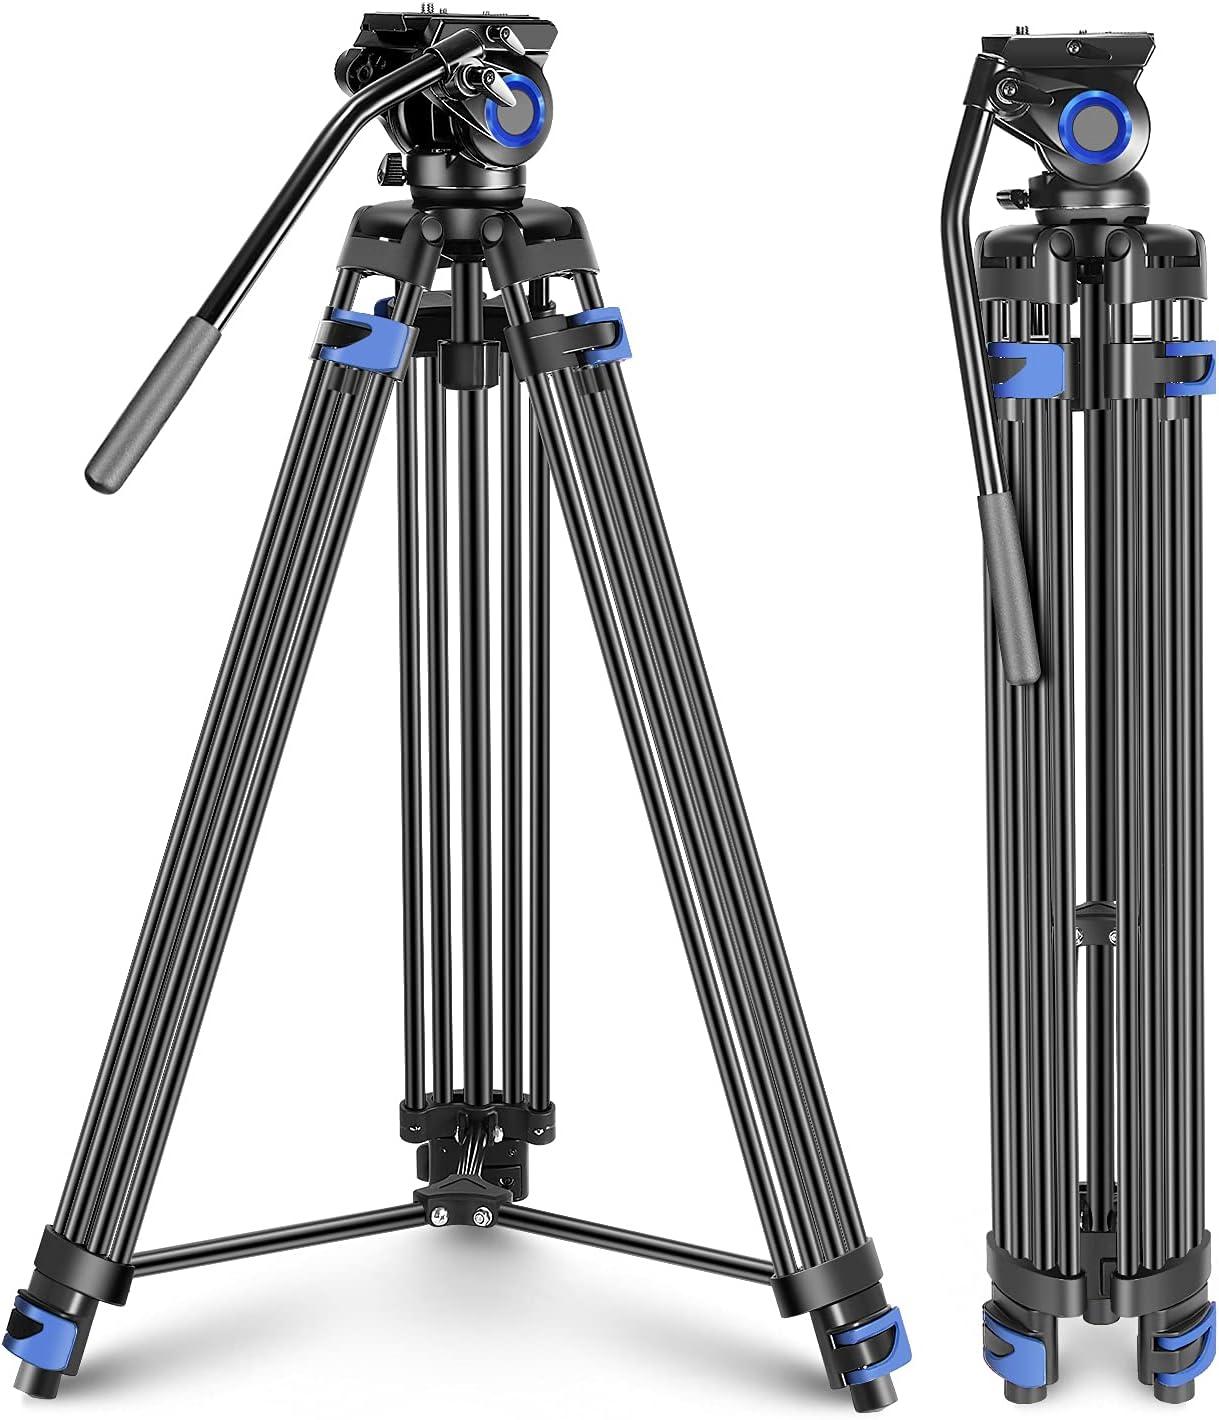 Neewer Max 43% OFF Professional Heavy Duty Video Aluminium Tripod 76-inch A Year-end gift